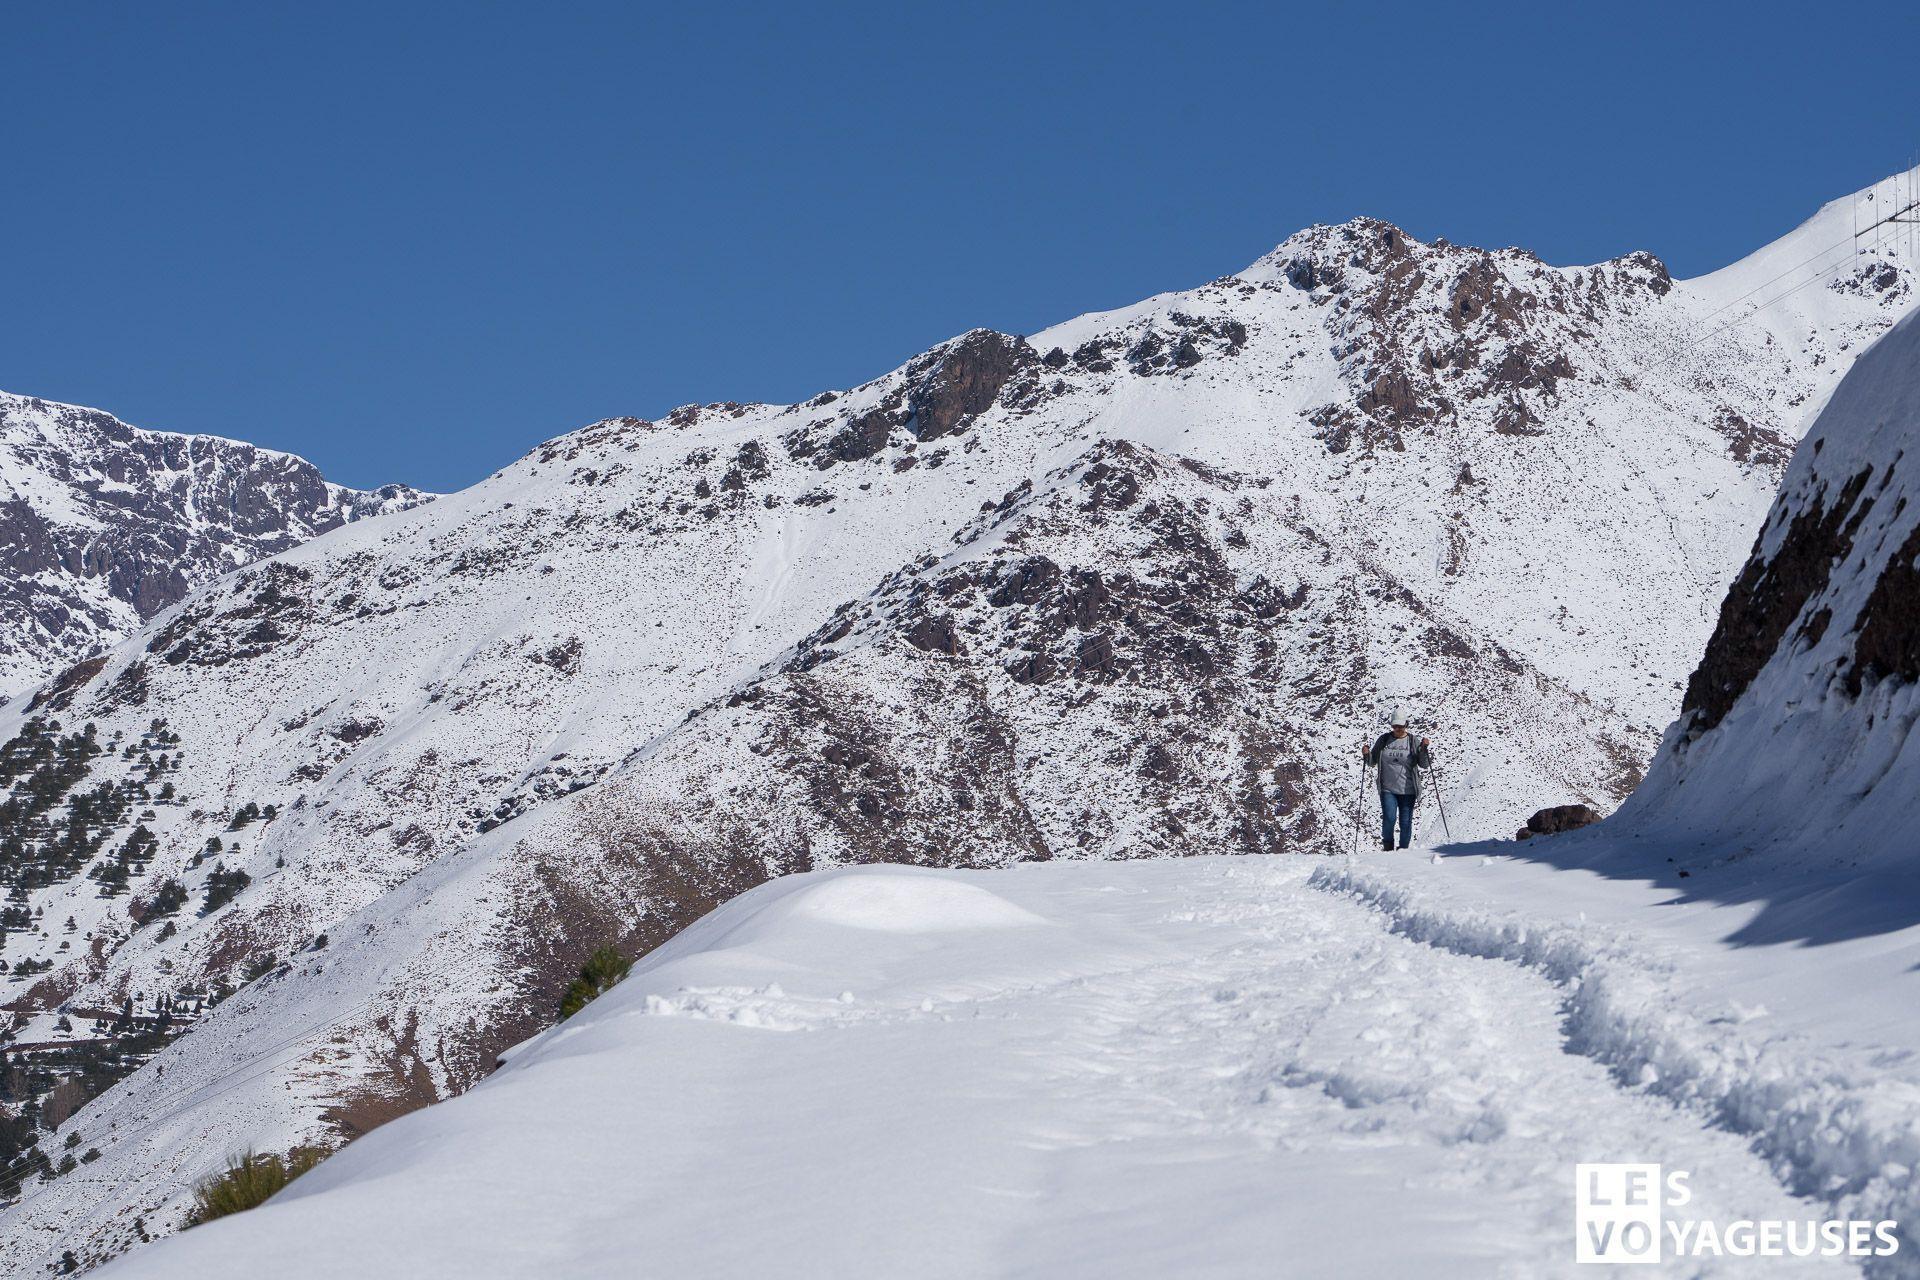 Les-voyageuses-maroc-imlil-hiver-00005